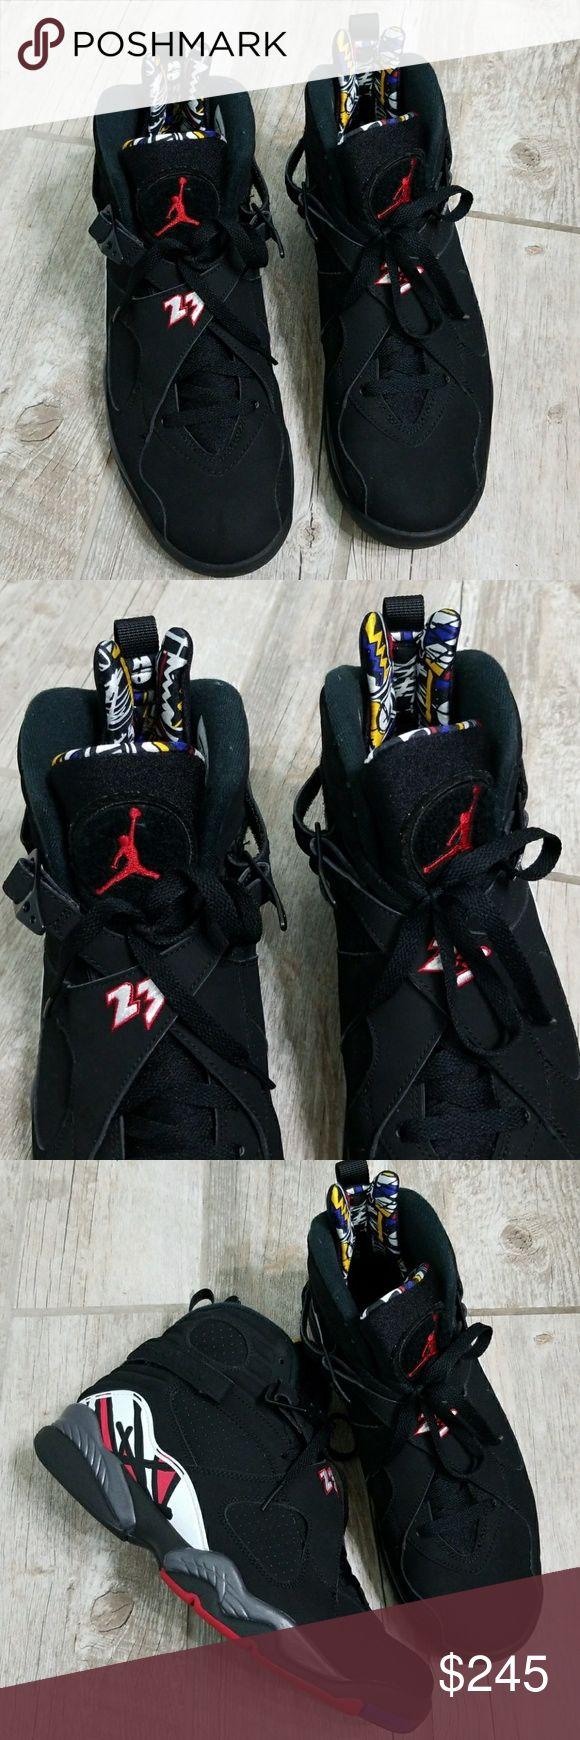 Jordan 8 playoffs Air Jordan's 8  like new only worn once original box. Authentic Jordan's great condition.  2013         *No trades* Jordan Shoes Sneakers